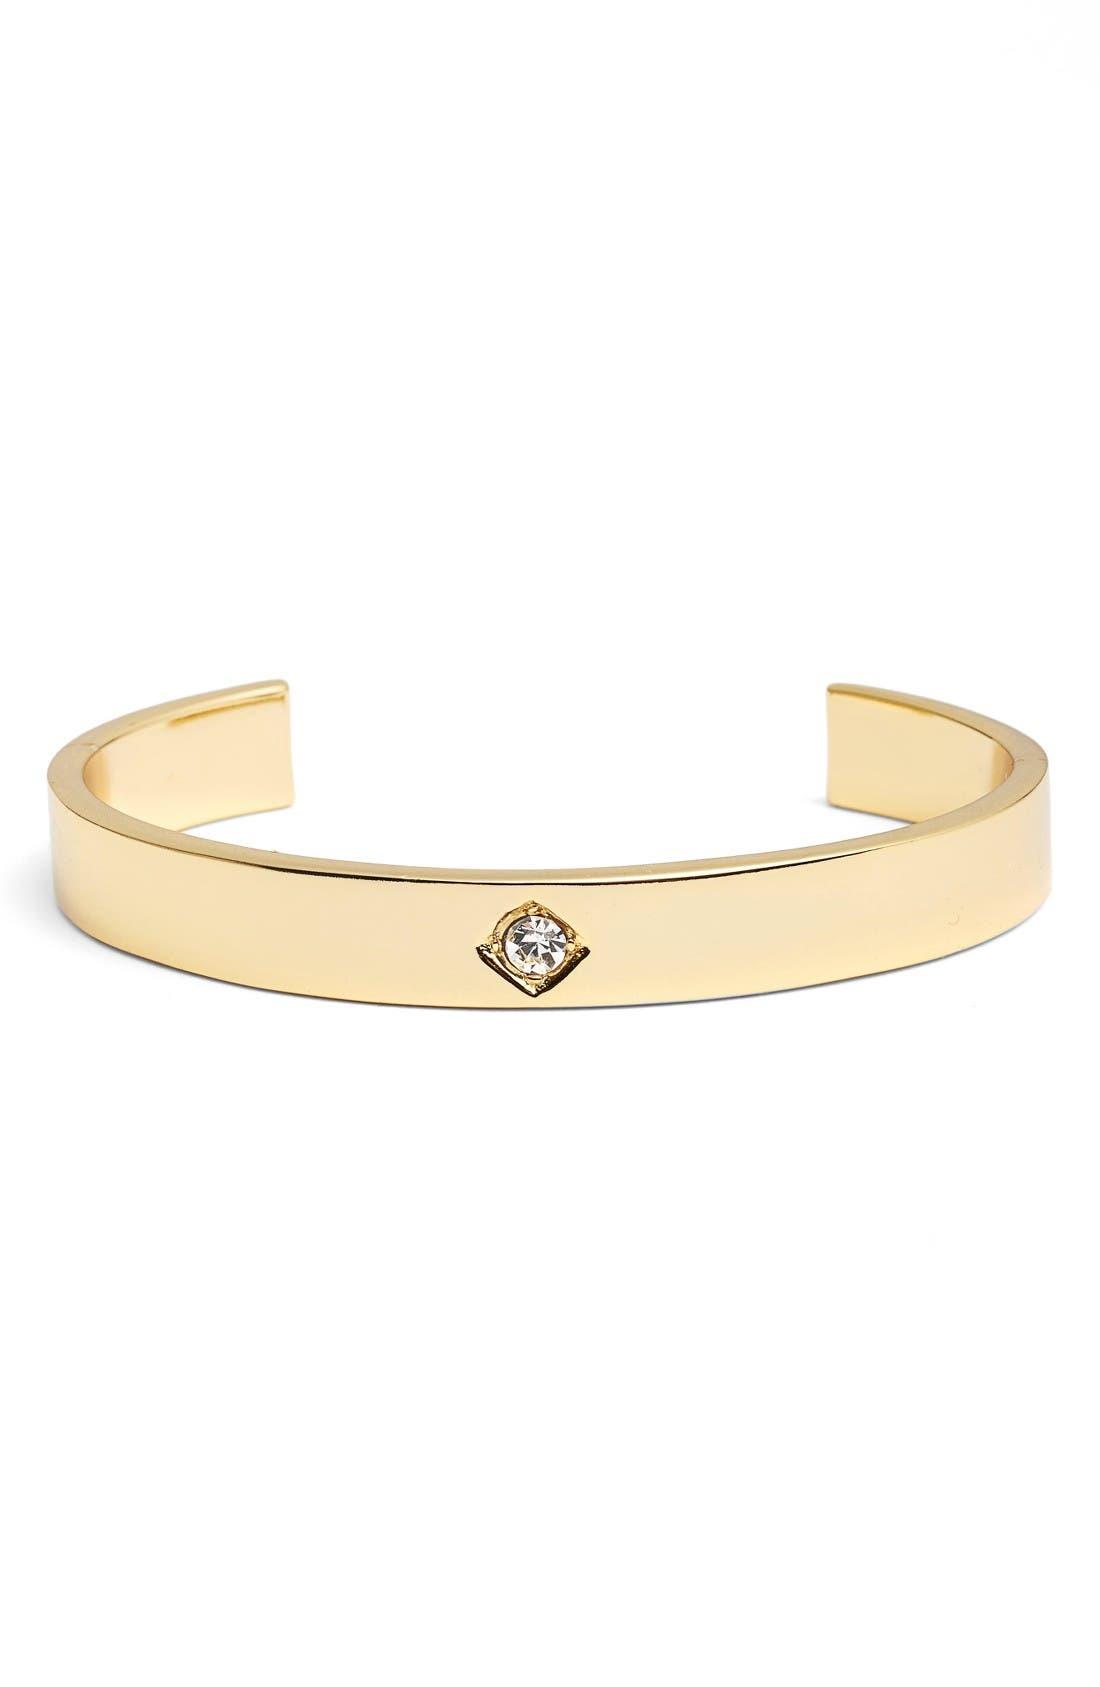 Main Image - Jules Smith Tulum Cuff Bracelet